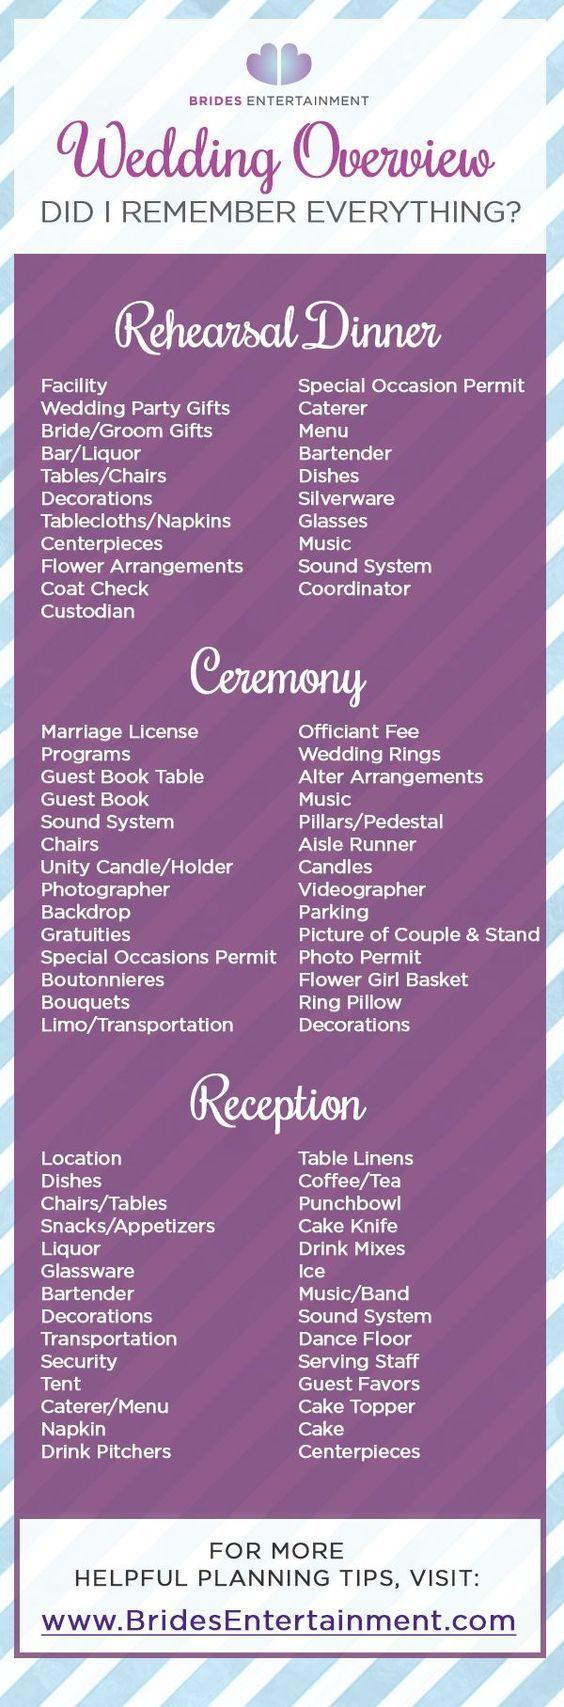 best wedding inspo ideas images on pinterest wedding